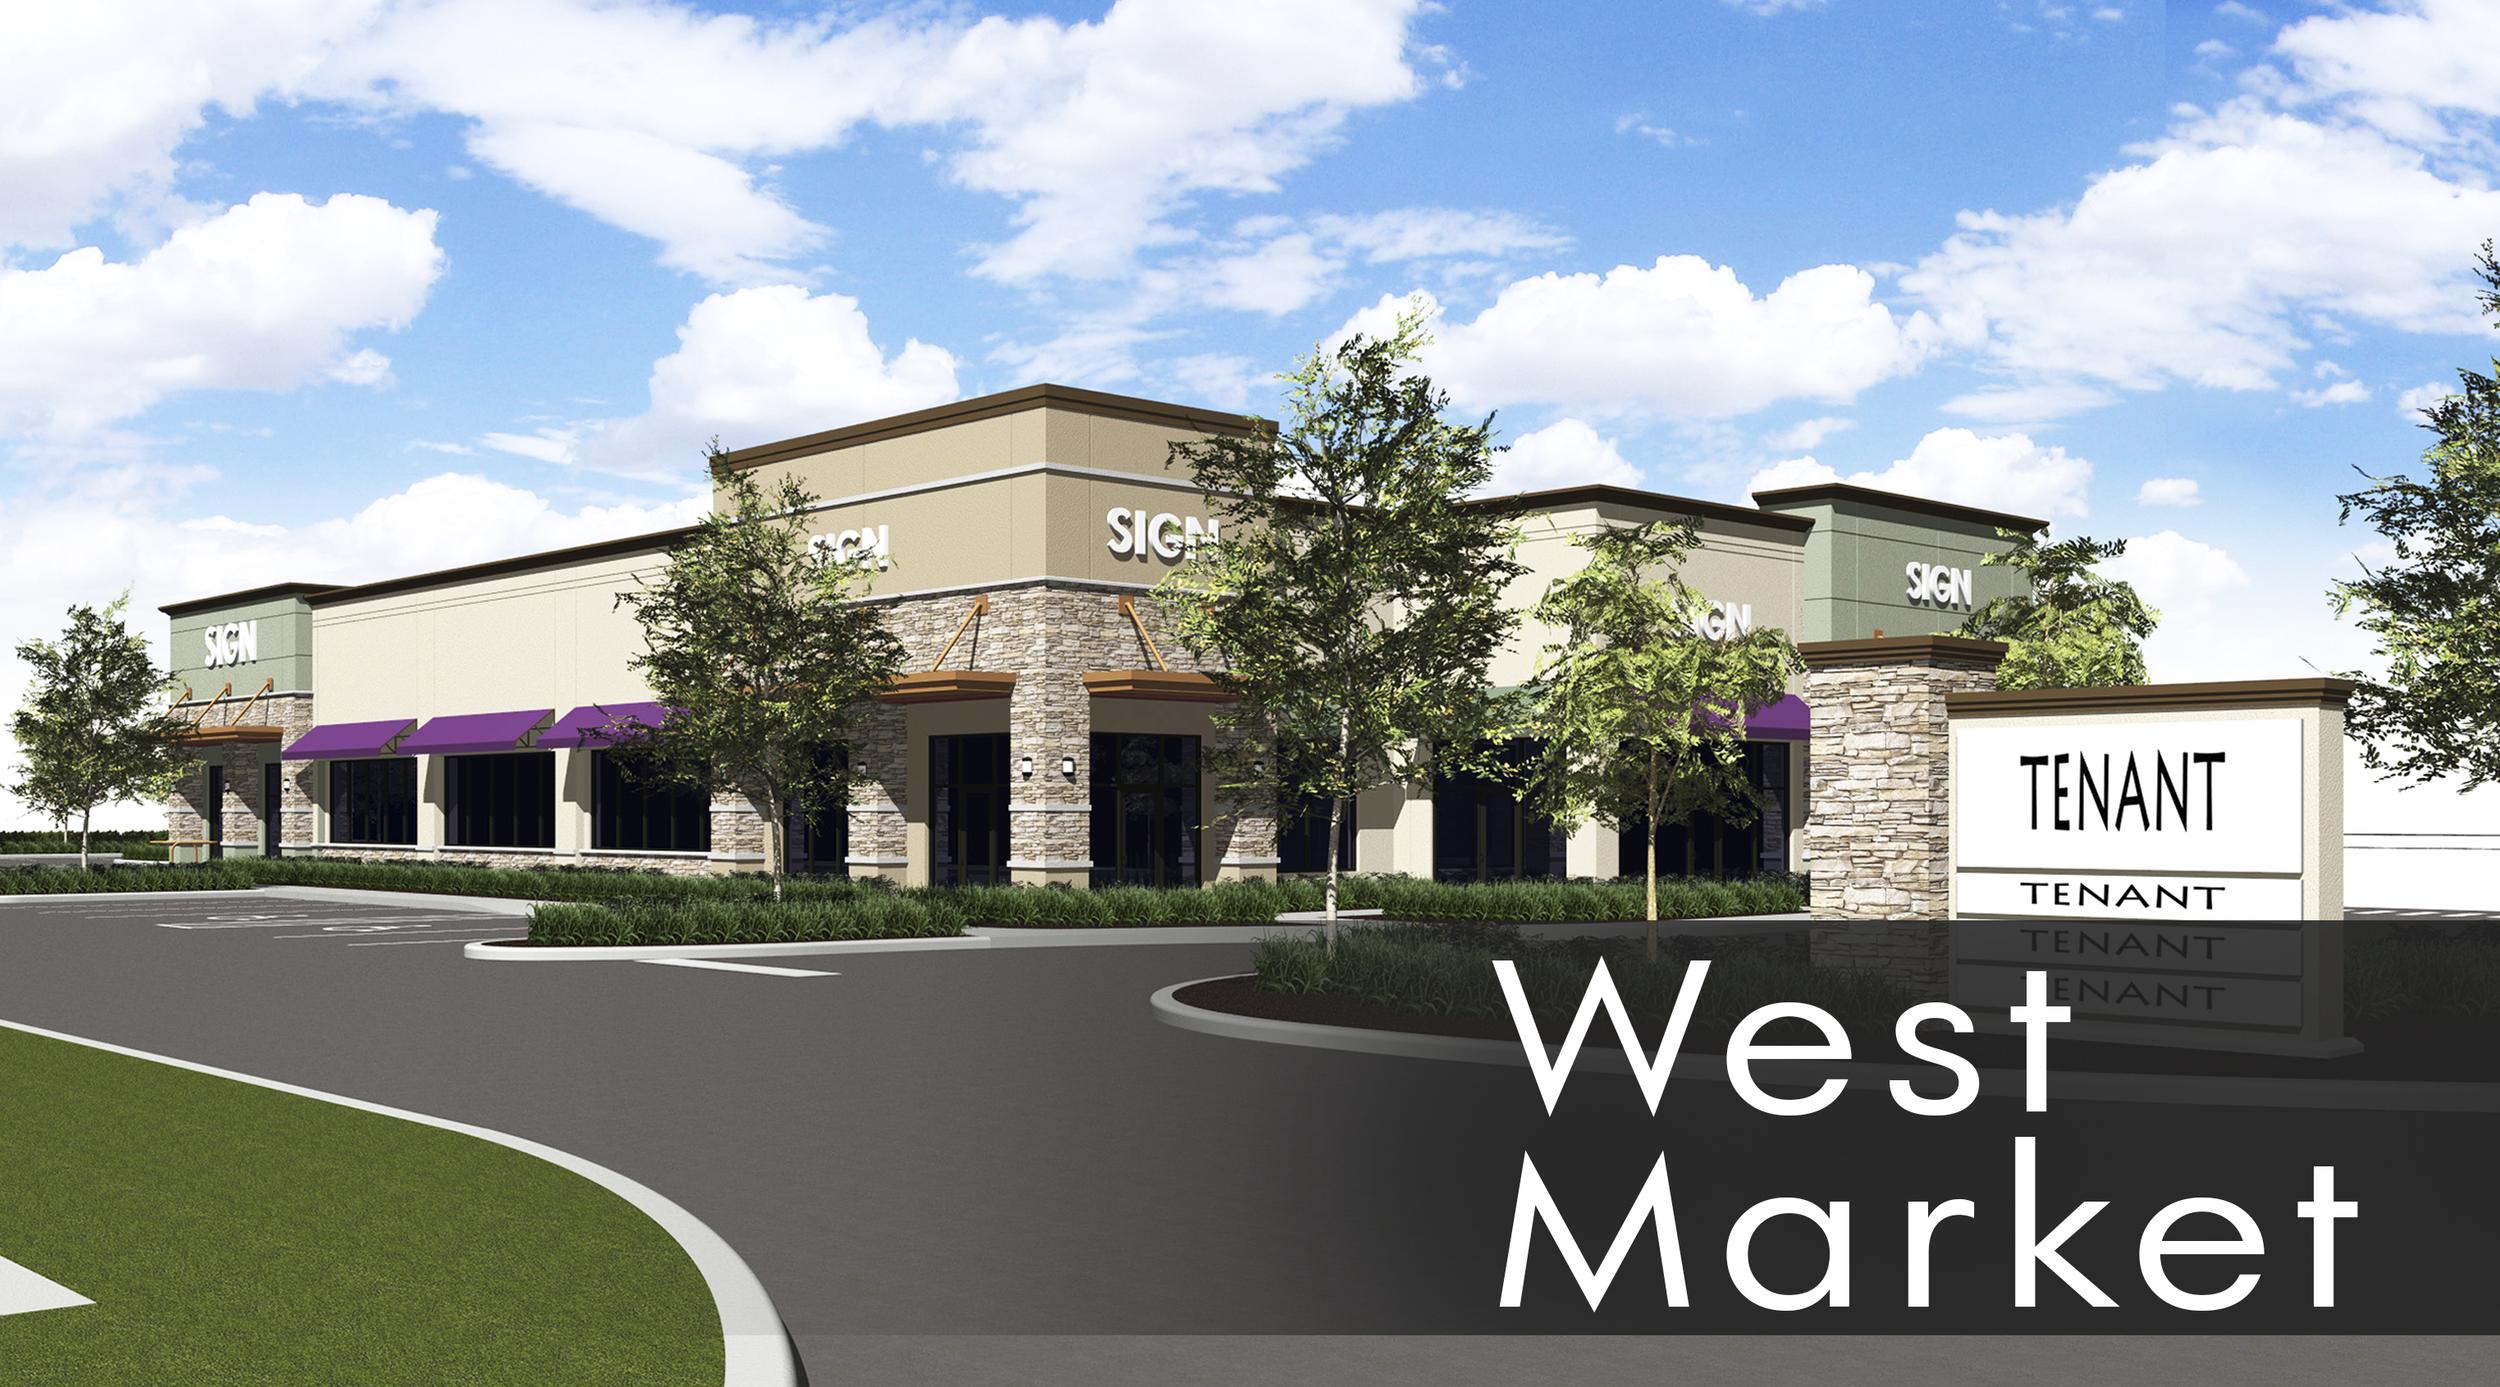 West Market - Winter Garden Land 18 Acres For Sale & For Lease